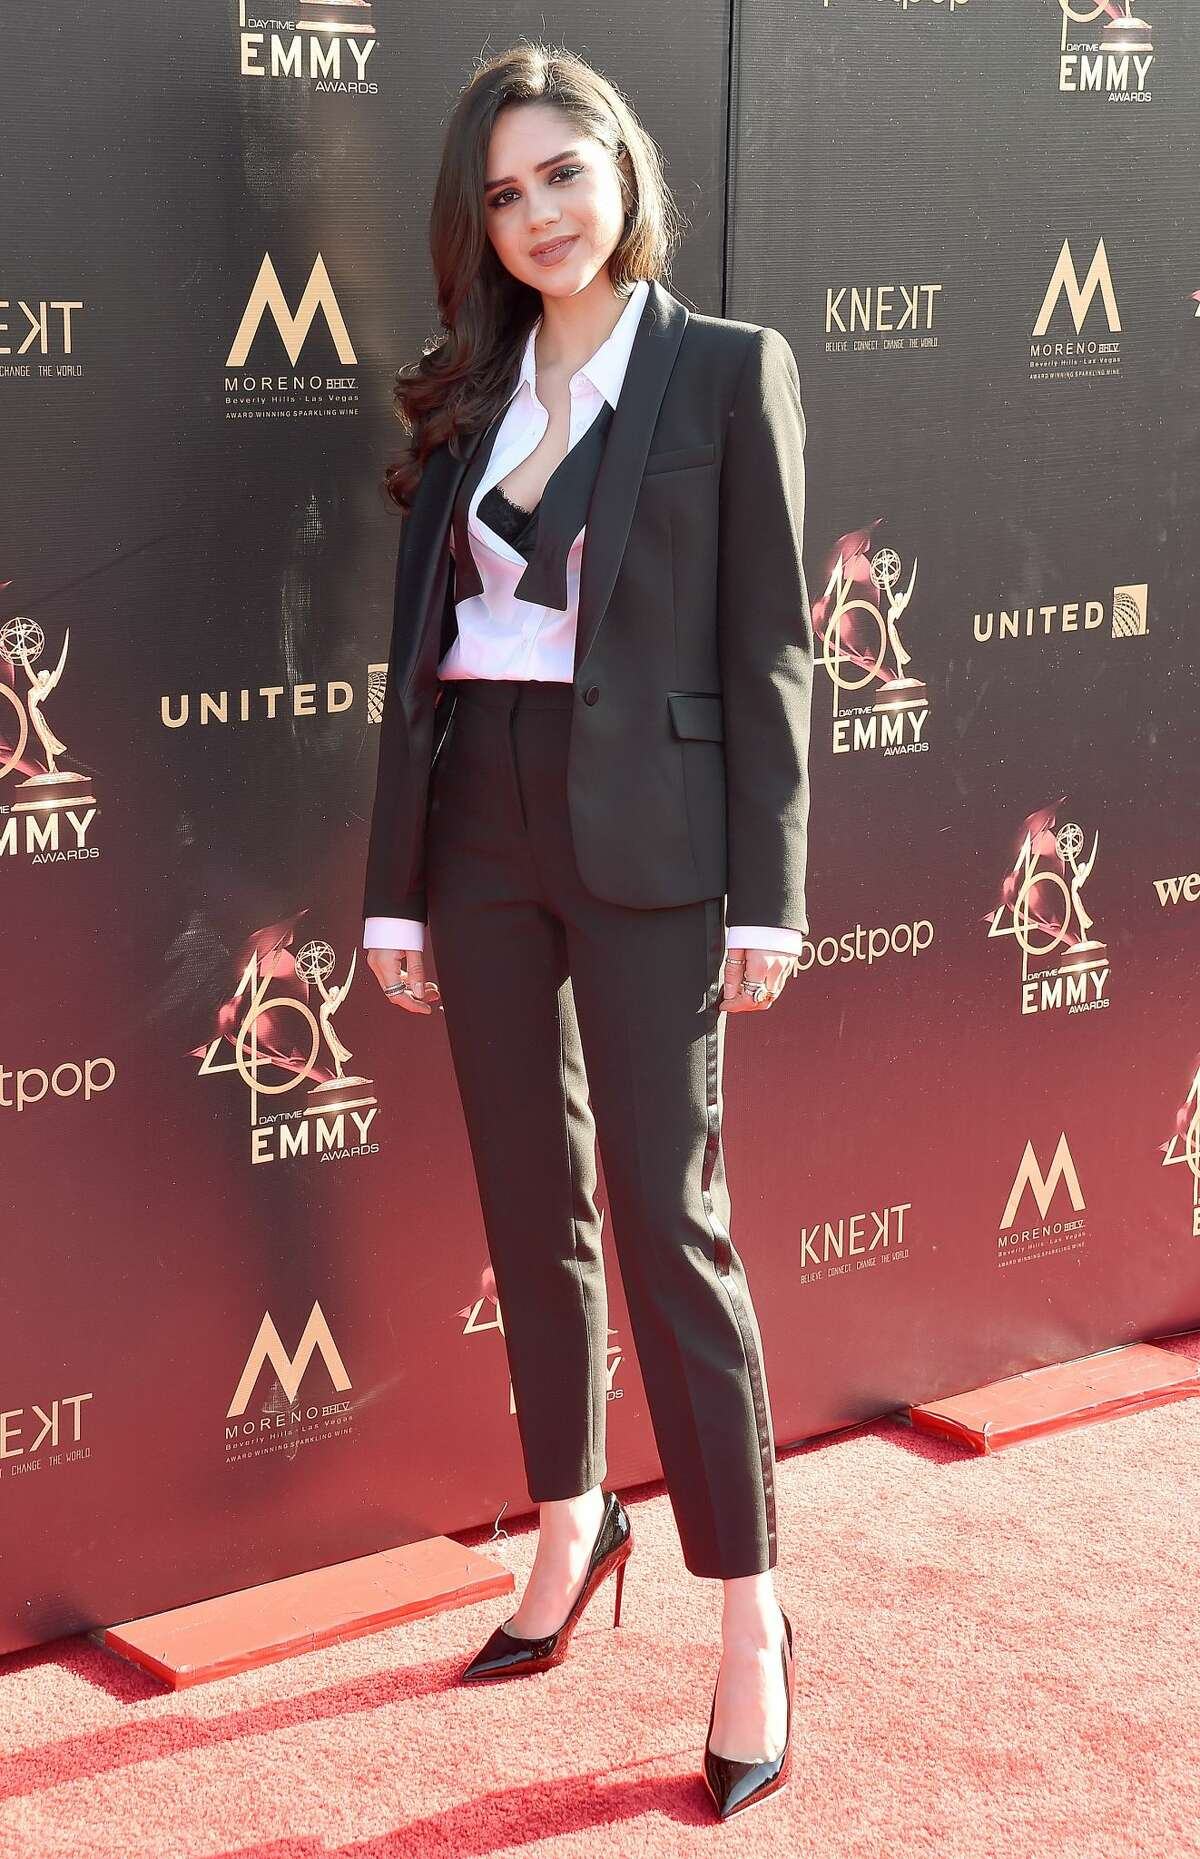 PASADENA, CA - MAY 03: Sasha Calle arrives at the 46th Annual Daytime Creative Arts Emmy Awards at Pasadena Civic Center on May 3, 2019 in Pasadena, California. (Photo by Gregg DeGuire/Getty Images)